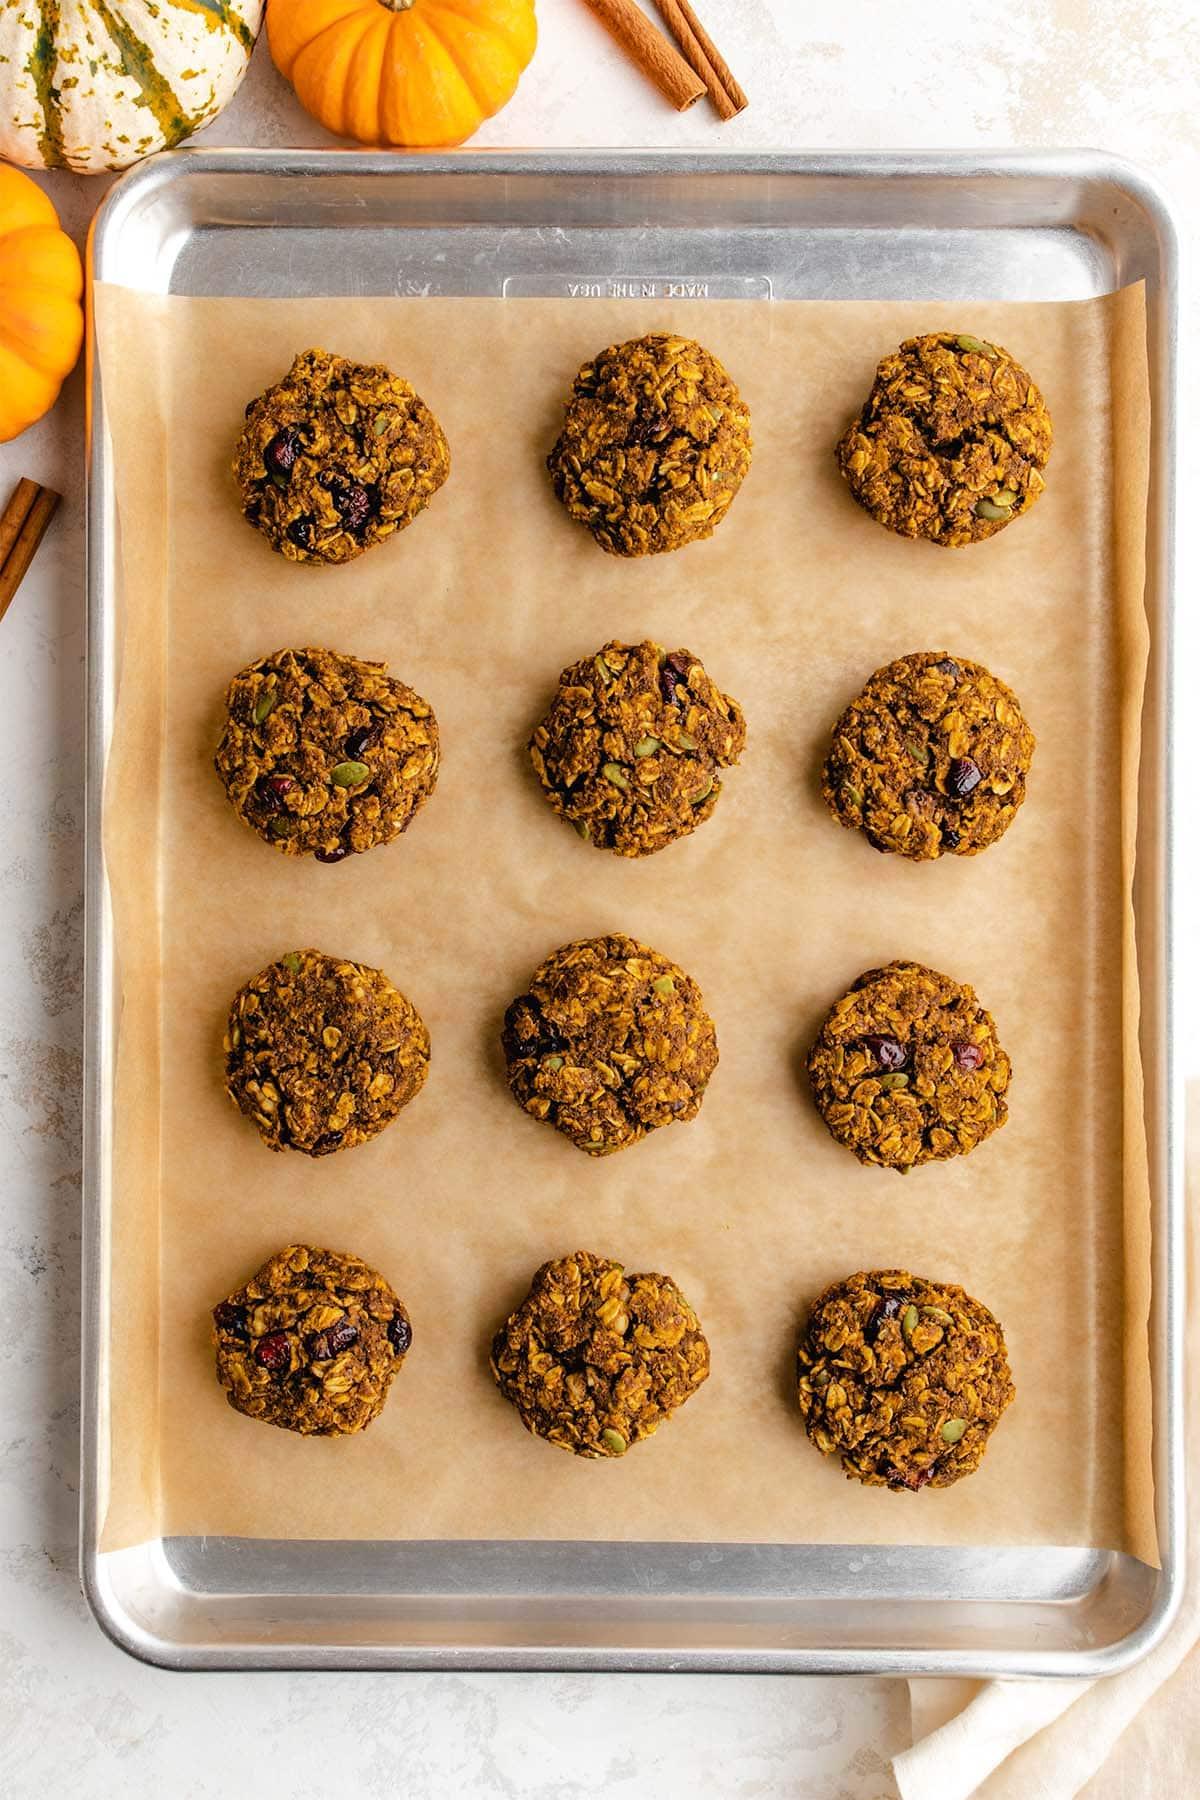 Twelve Pumpkin Breakfast Cookies on a parchment-lined baking sheet.